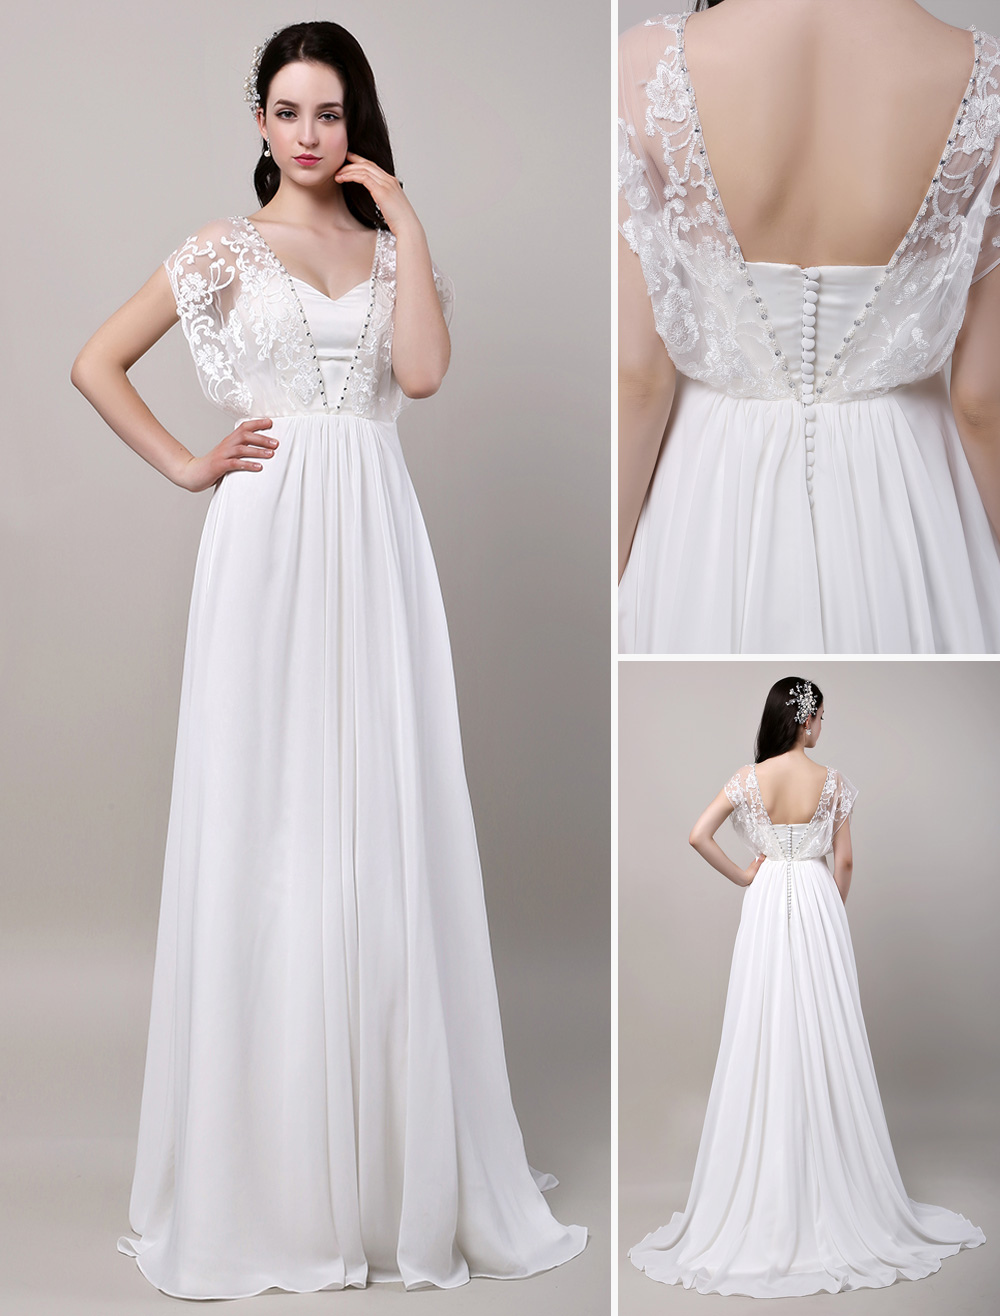 Milanoo / Boho Wedding Dress Sweatheart Butterfly Lace Sleeves Chiffon